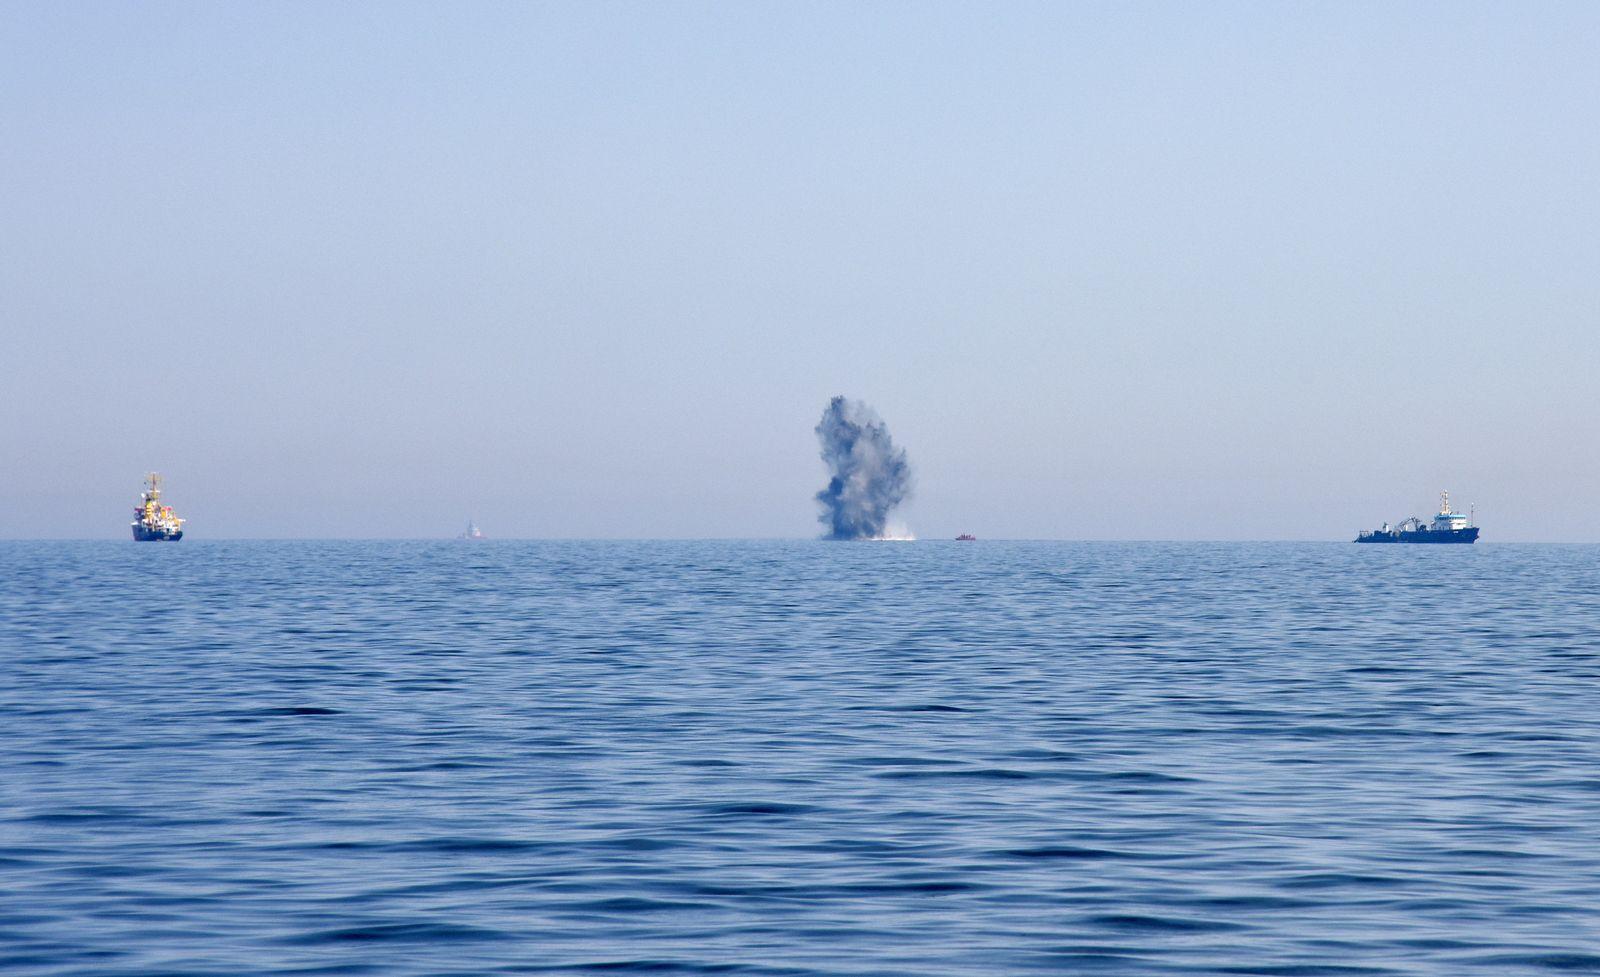 Torpedo vor Kühlungsborn gesprengt